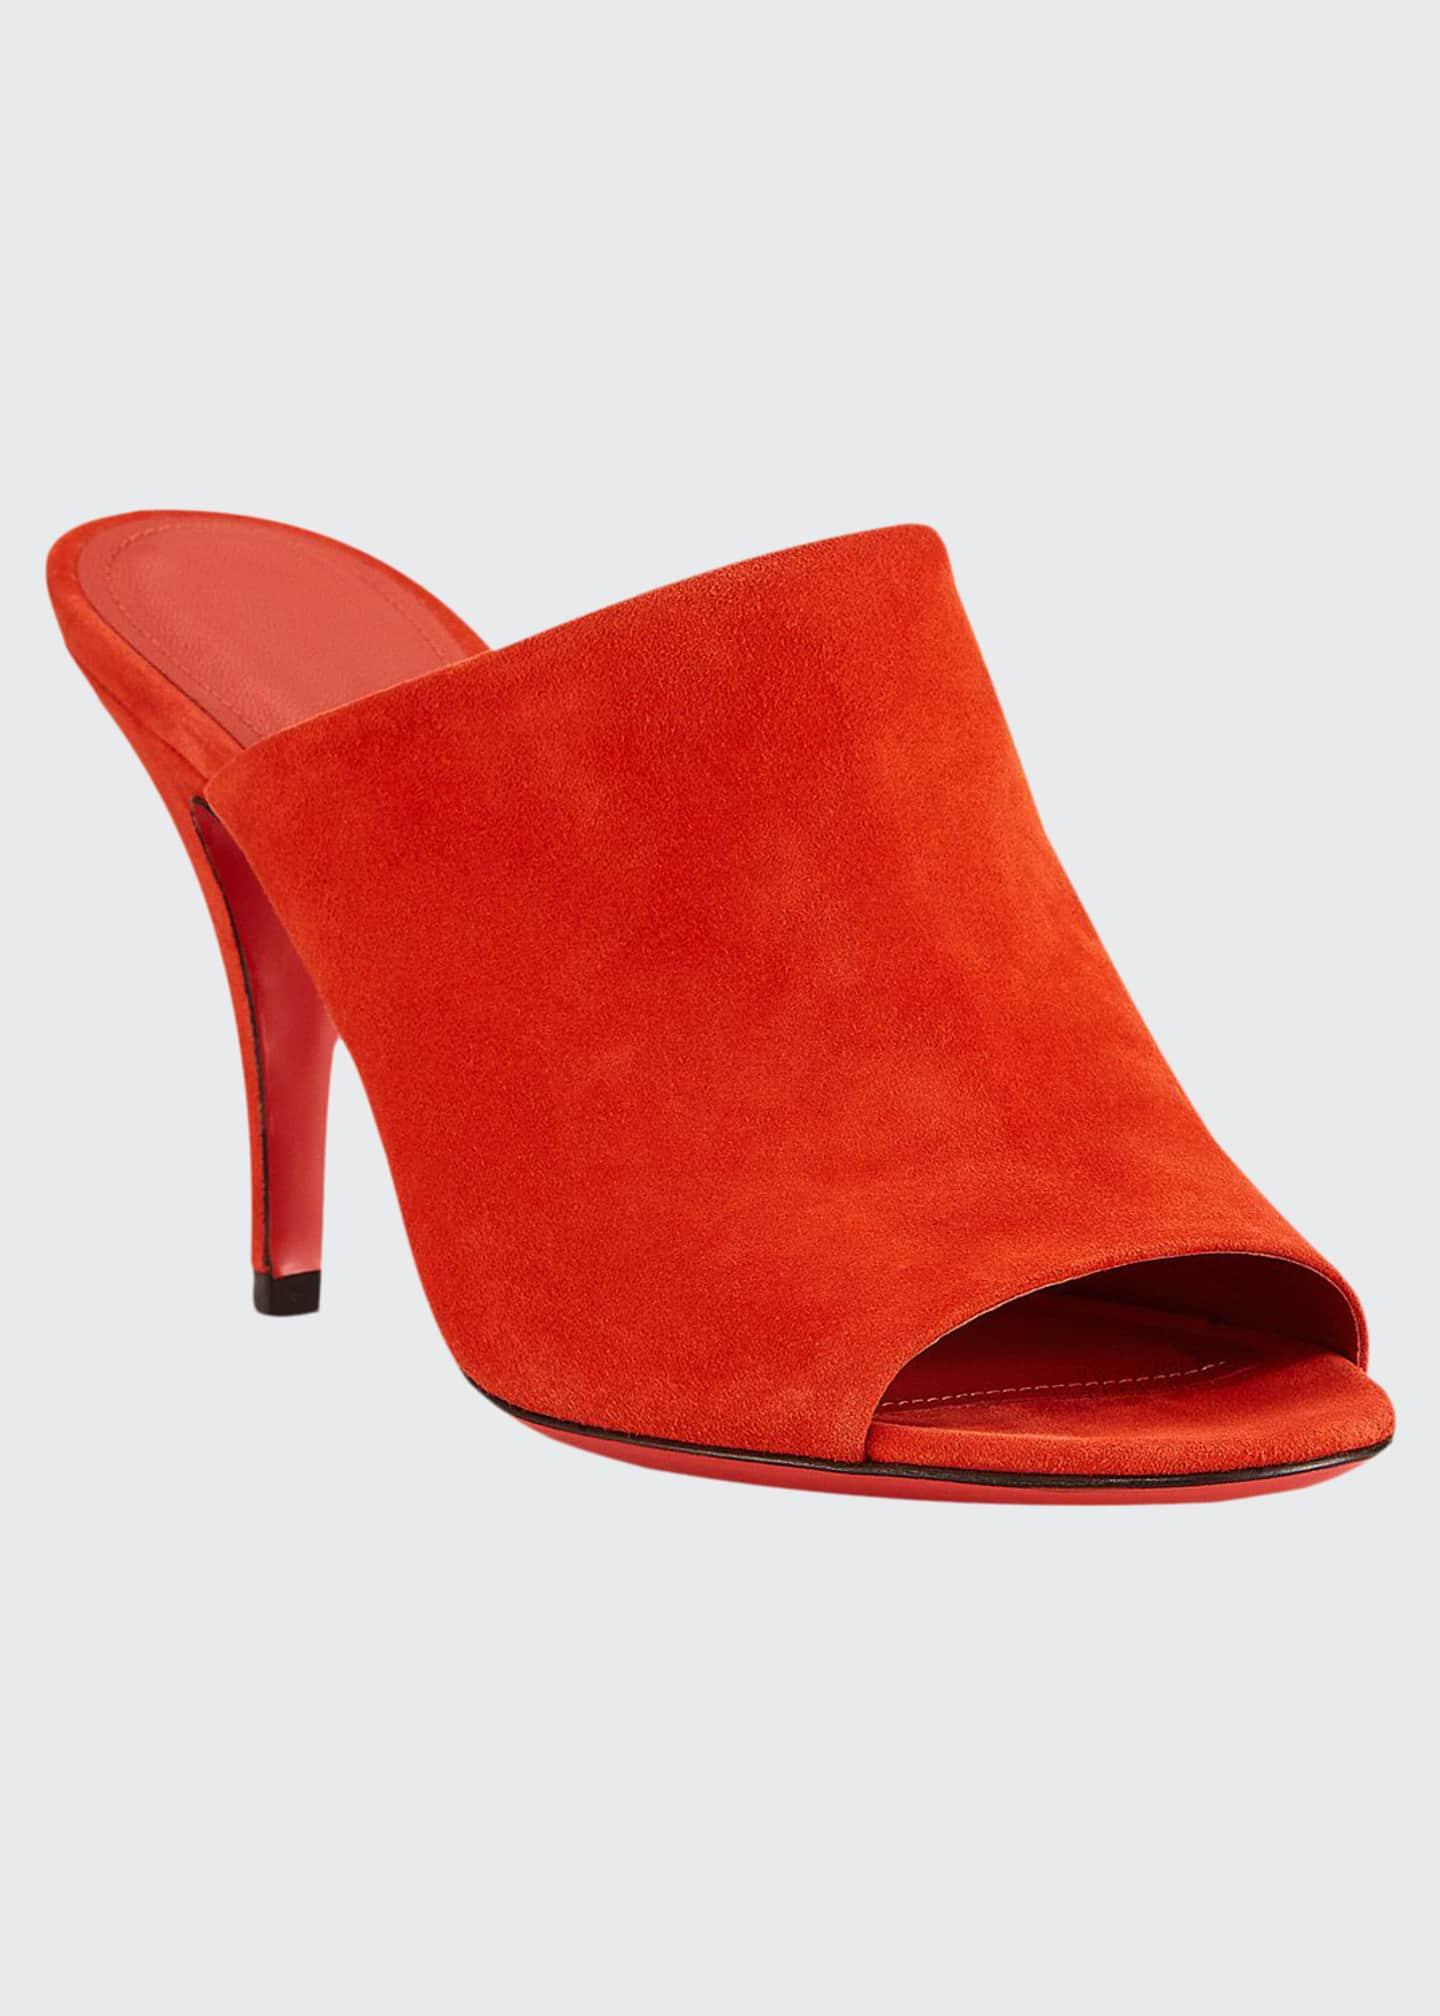 Salvatore Ferragamo Janine Suede Mule Sandals